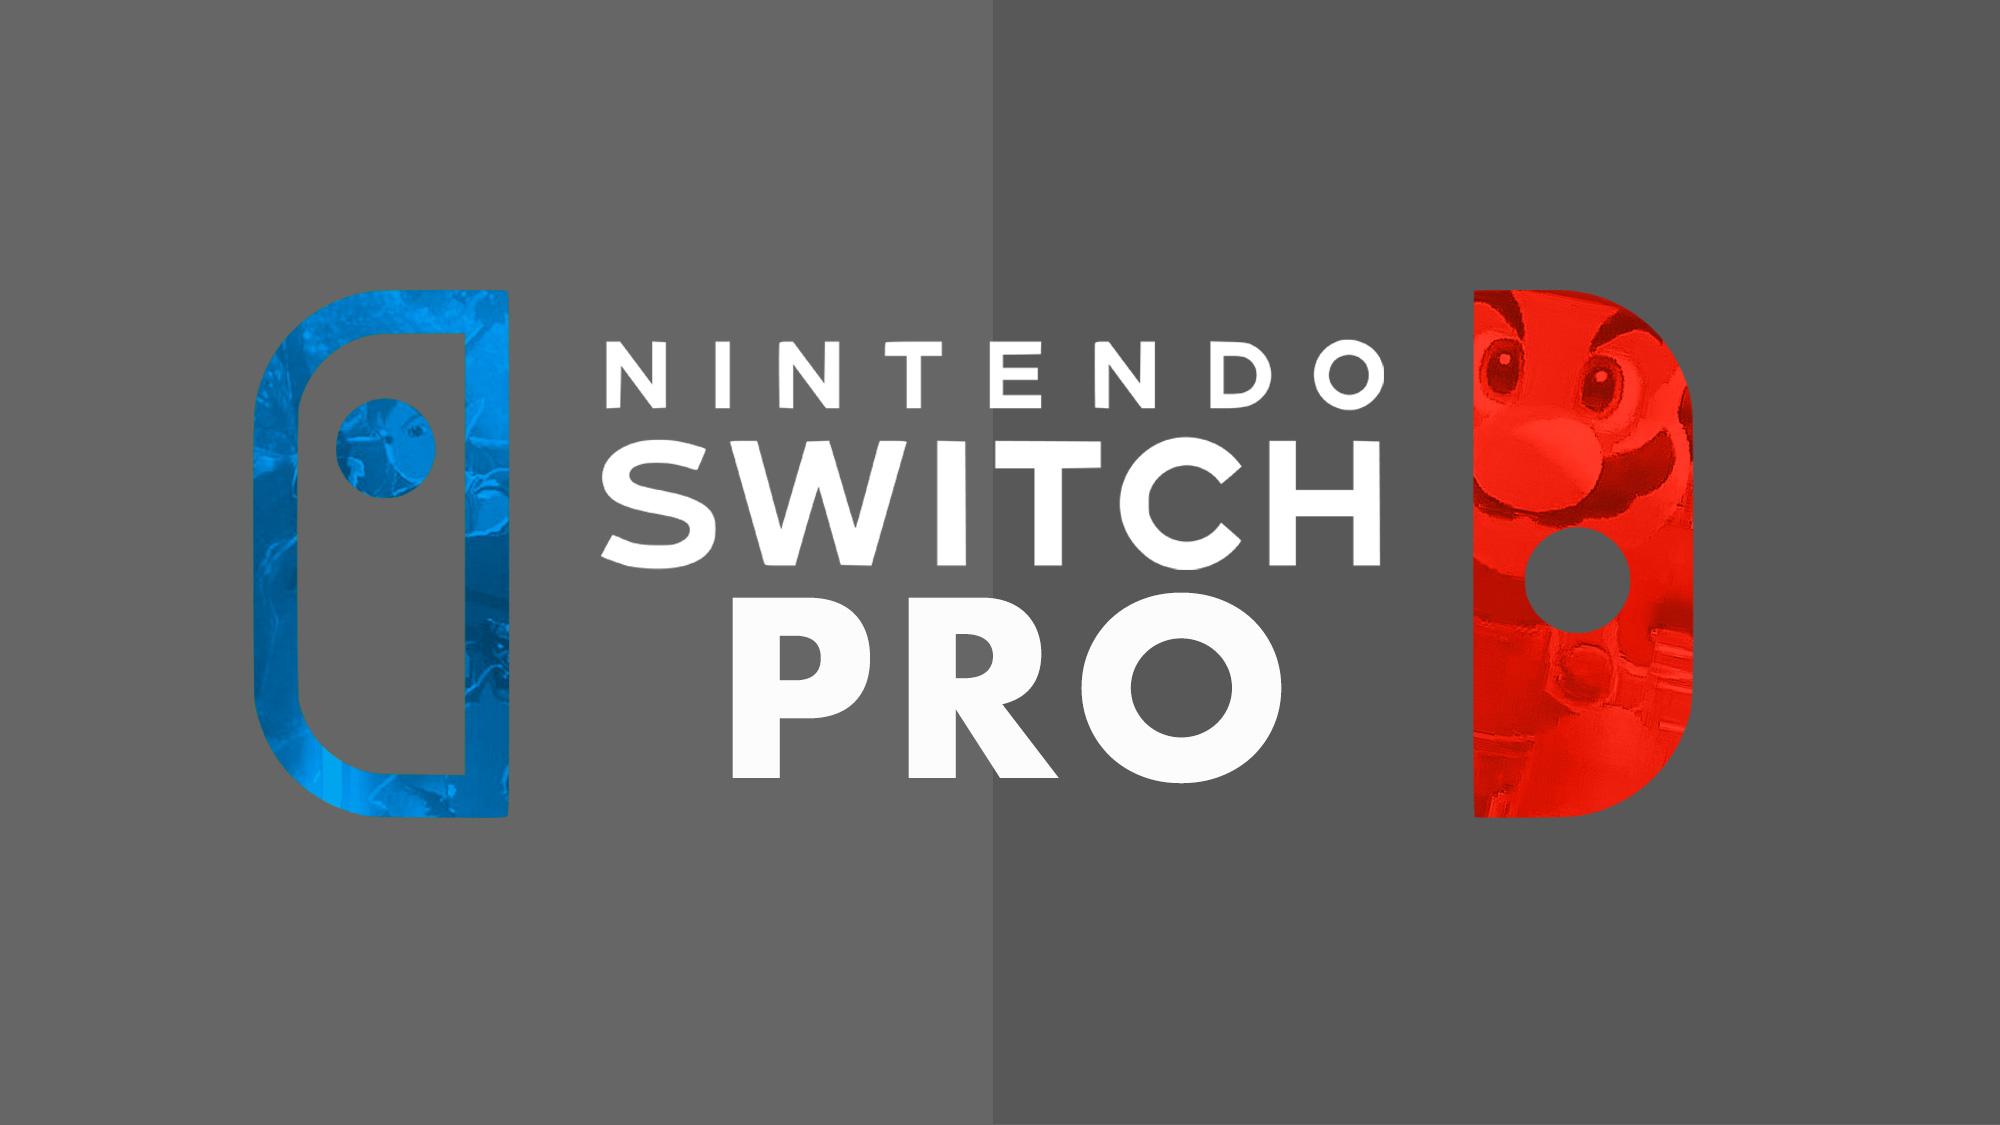 Pro switch